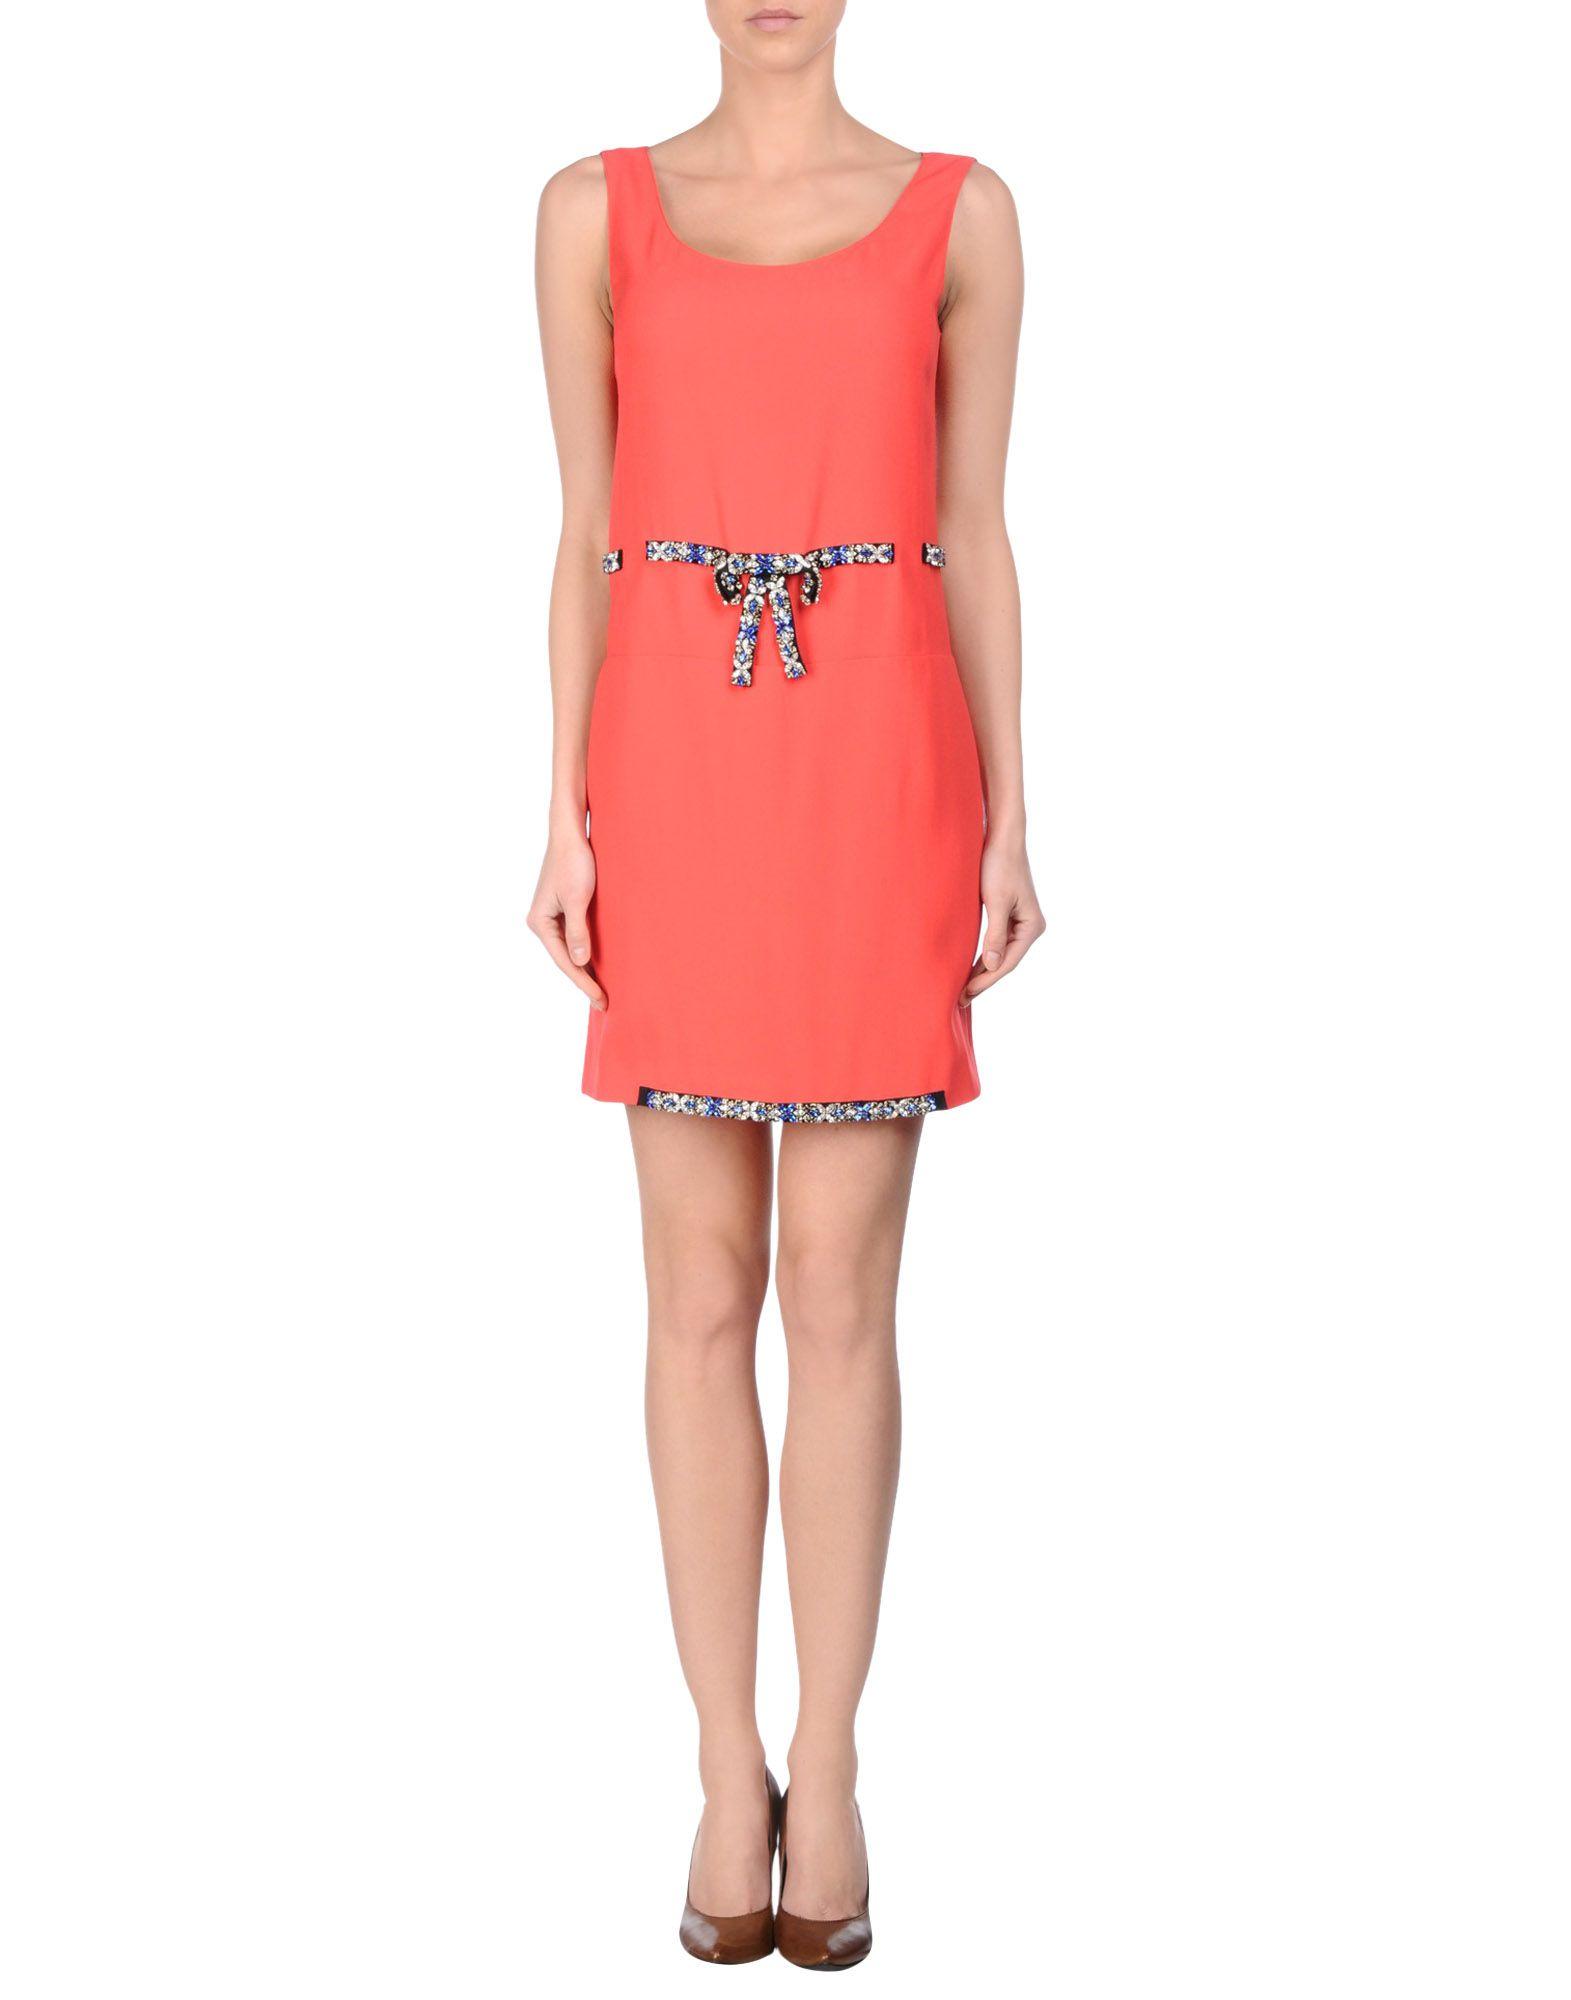 lyst prada short dress in red